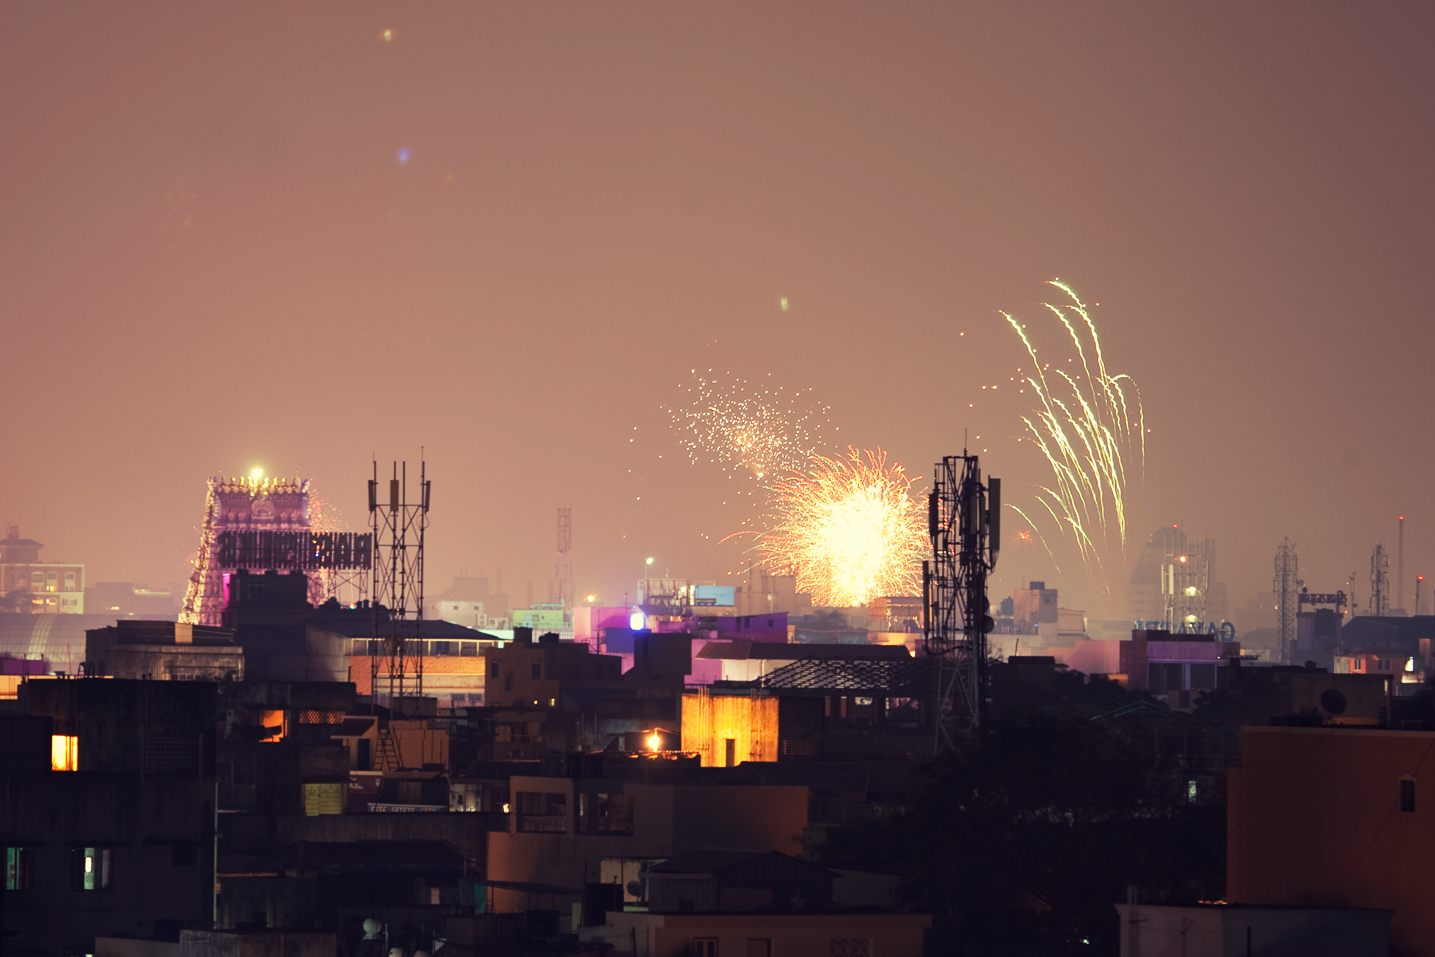 Union, Delhi governments urge residents to observe 'cracker-free' Diwali